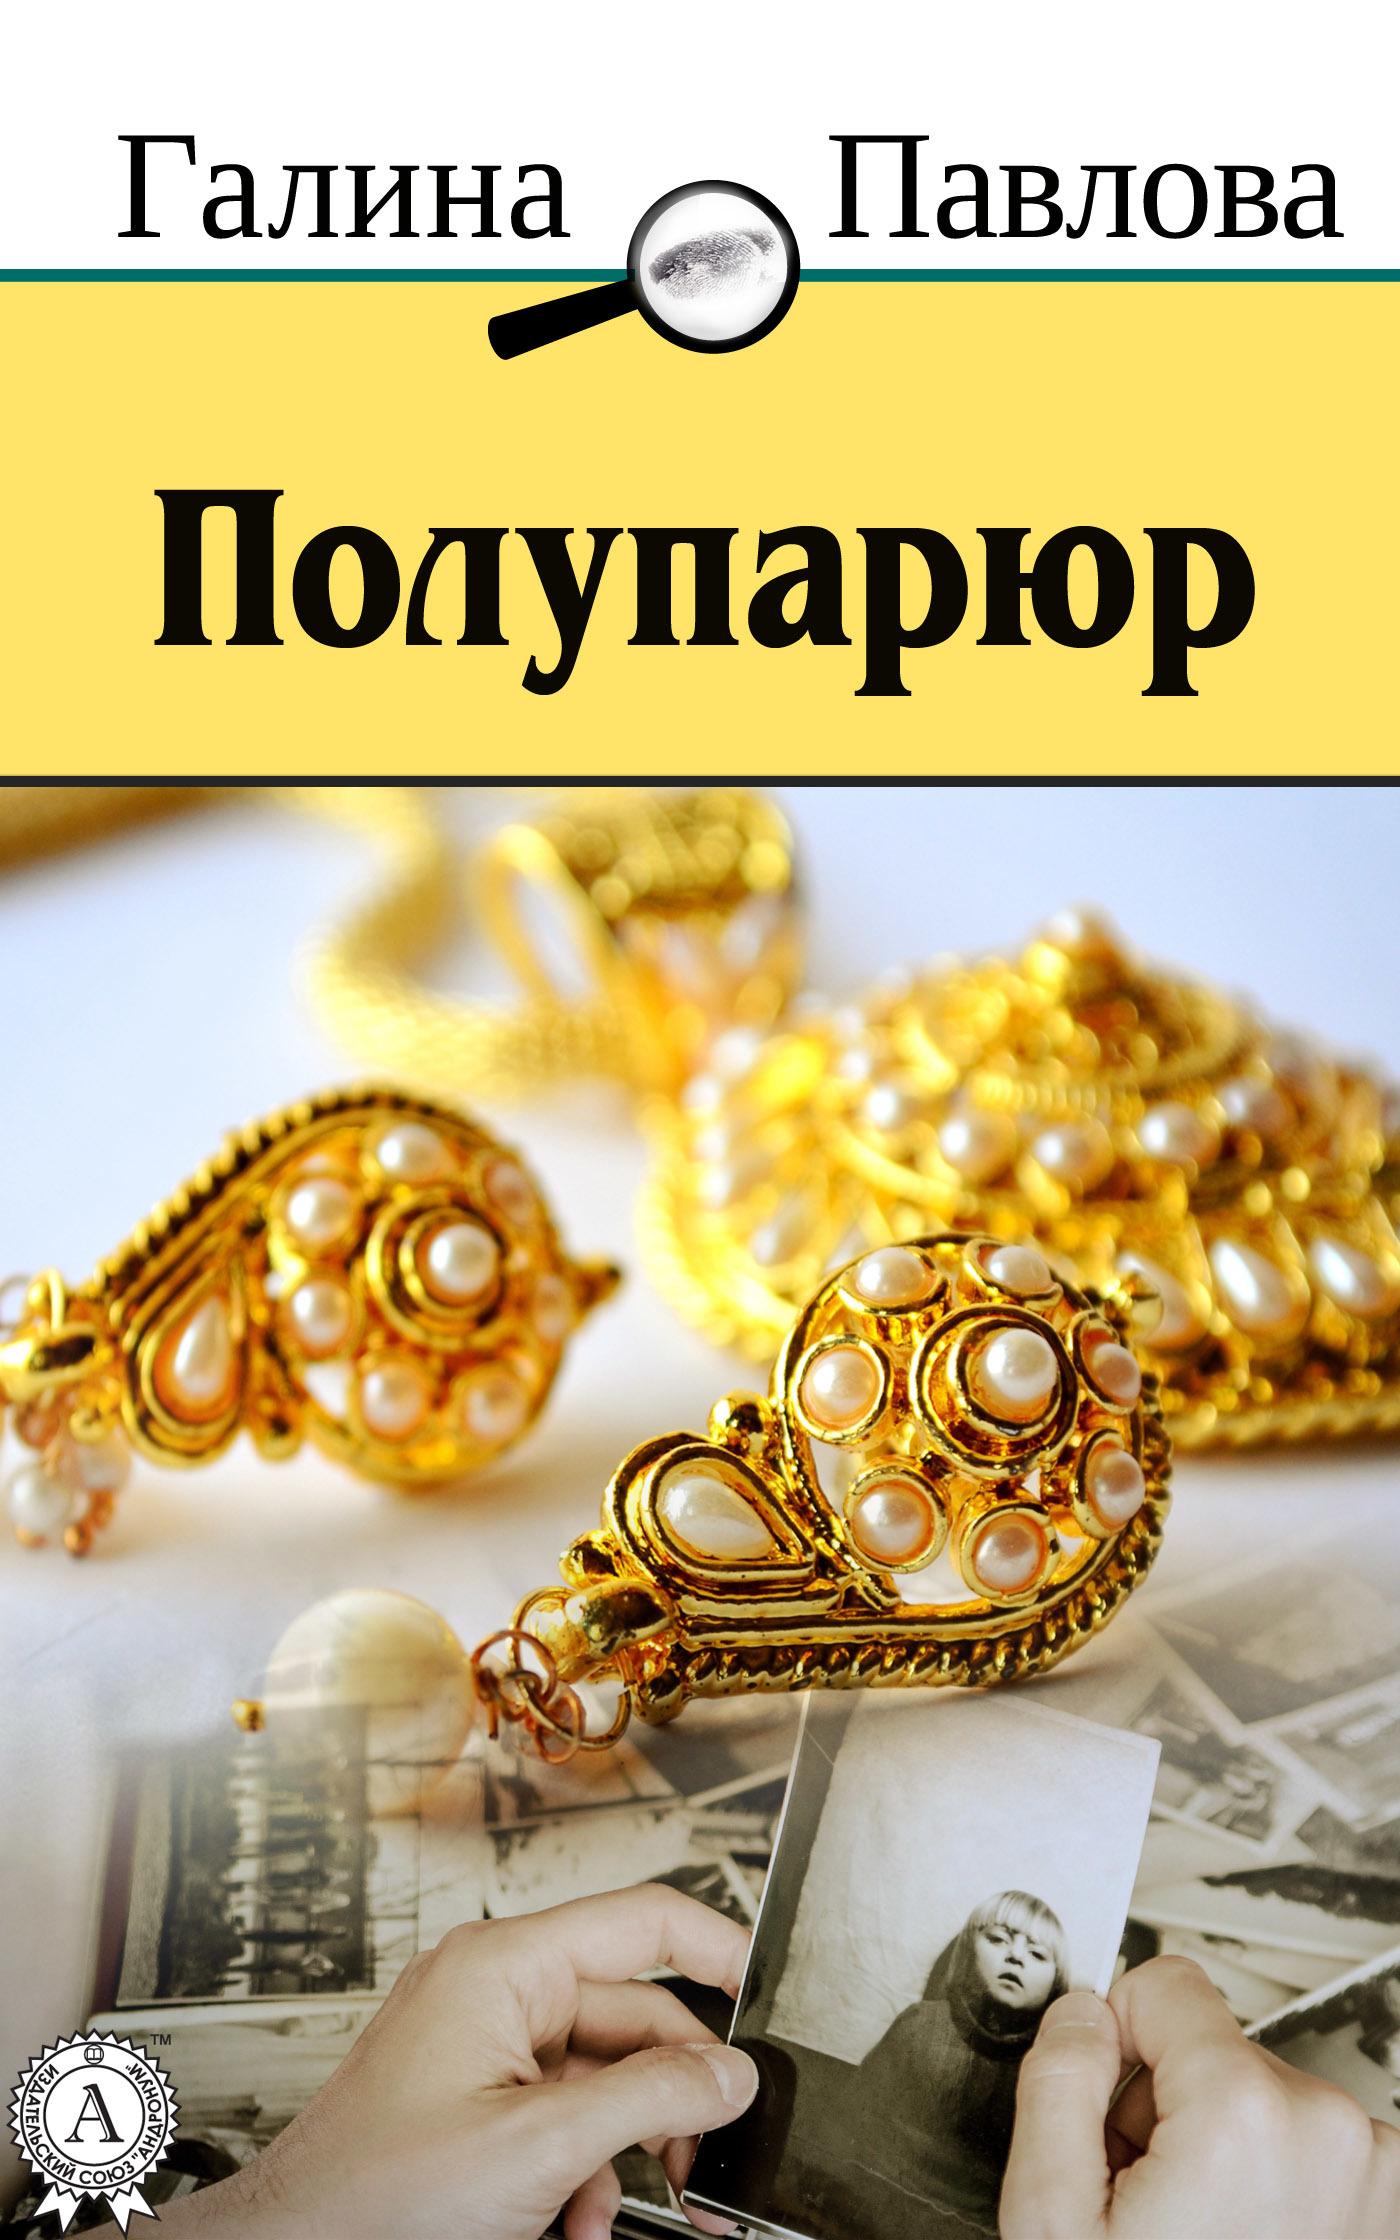 Галина Павлова бесплатно